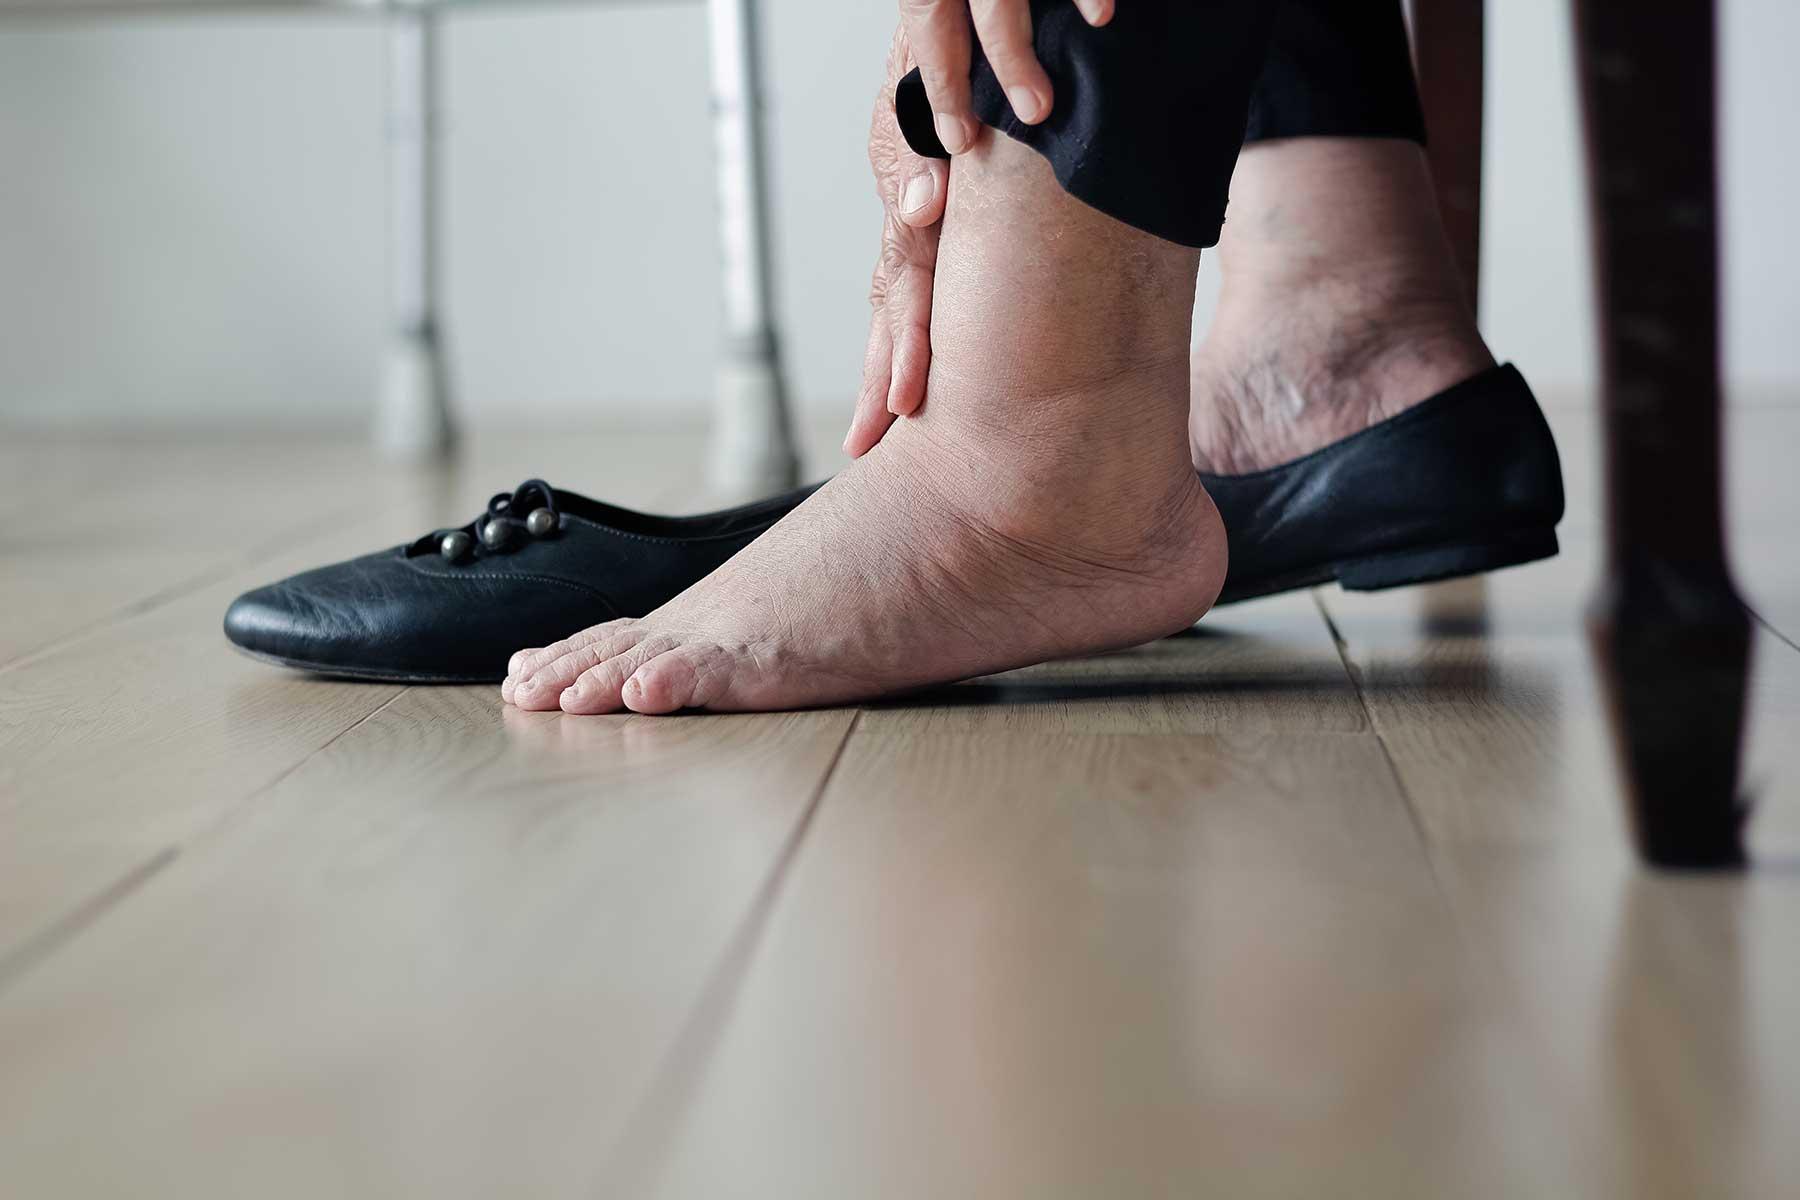 Diabetic Foot Care at the Farnham Foot Clinic